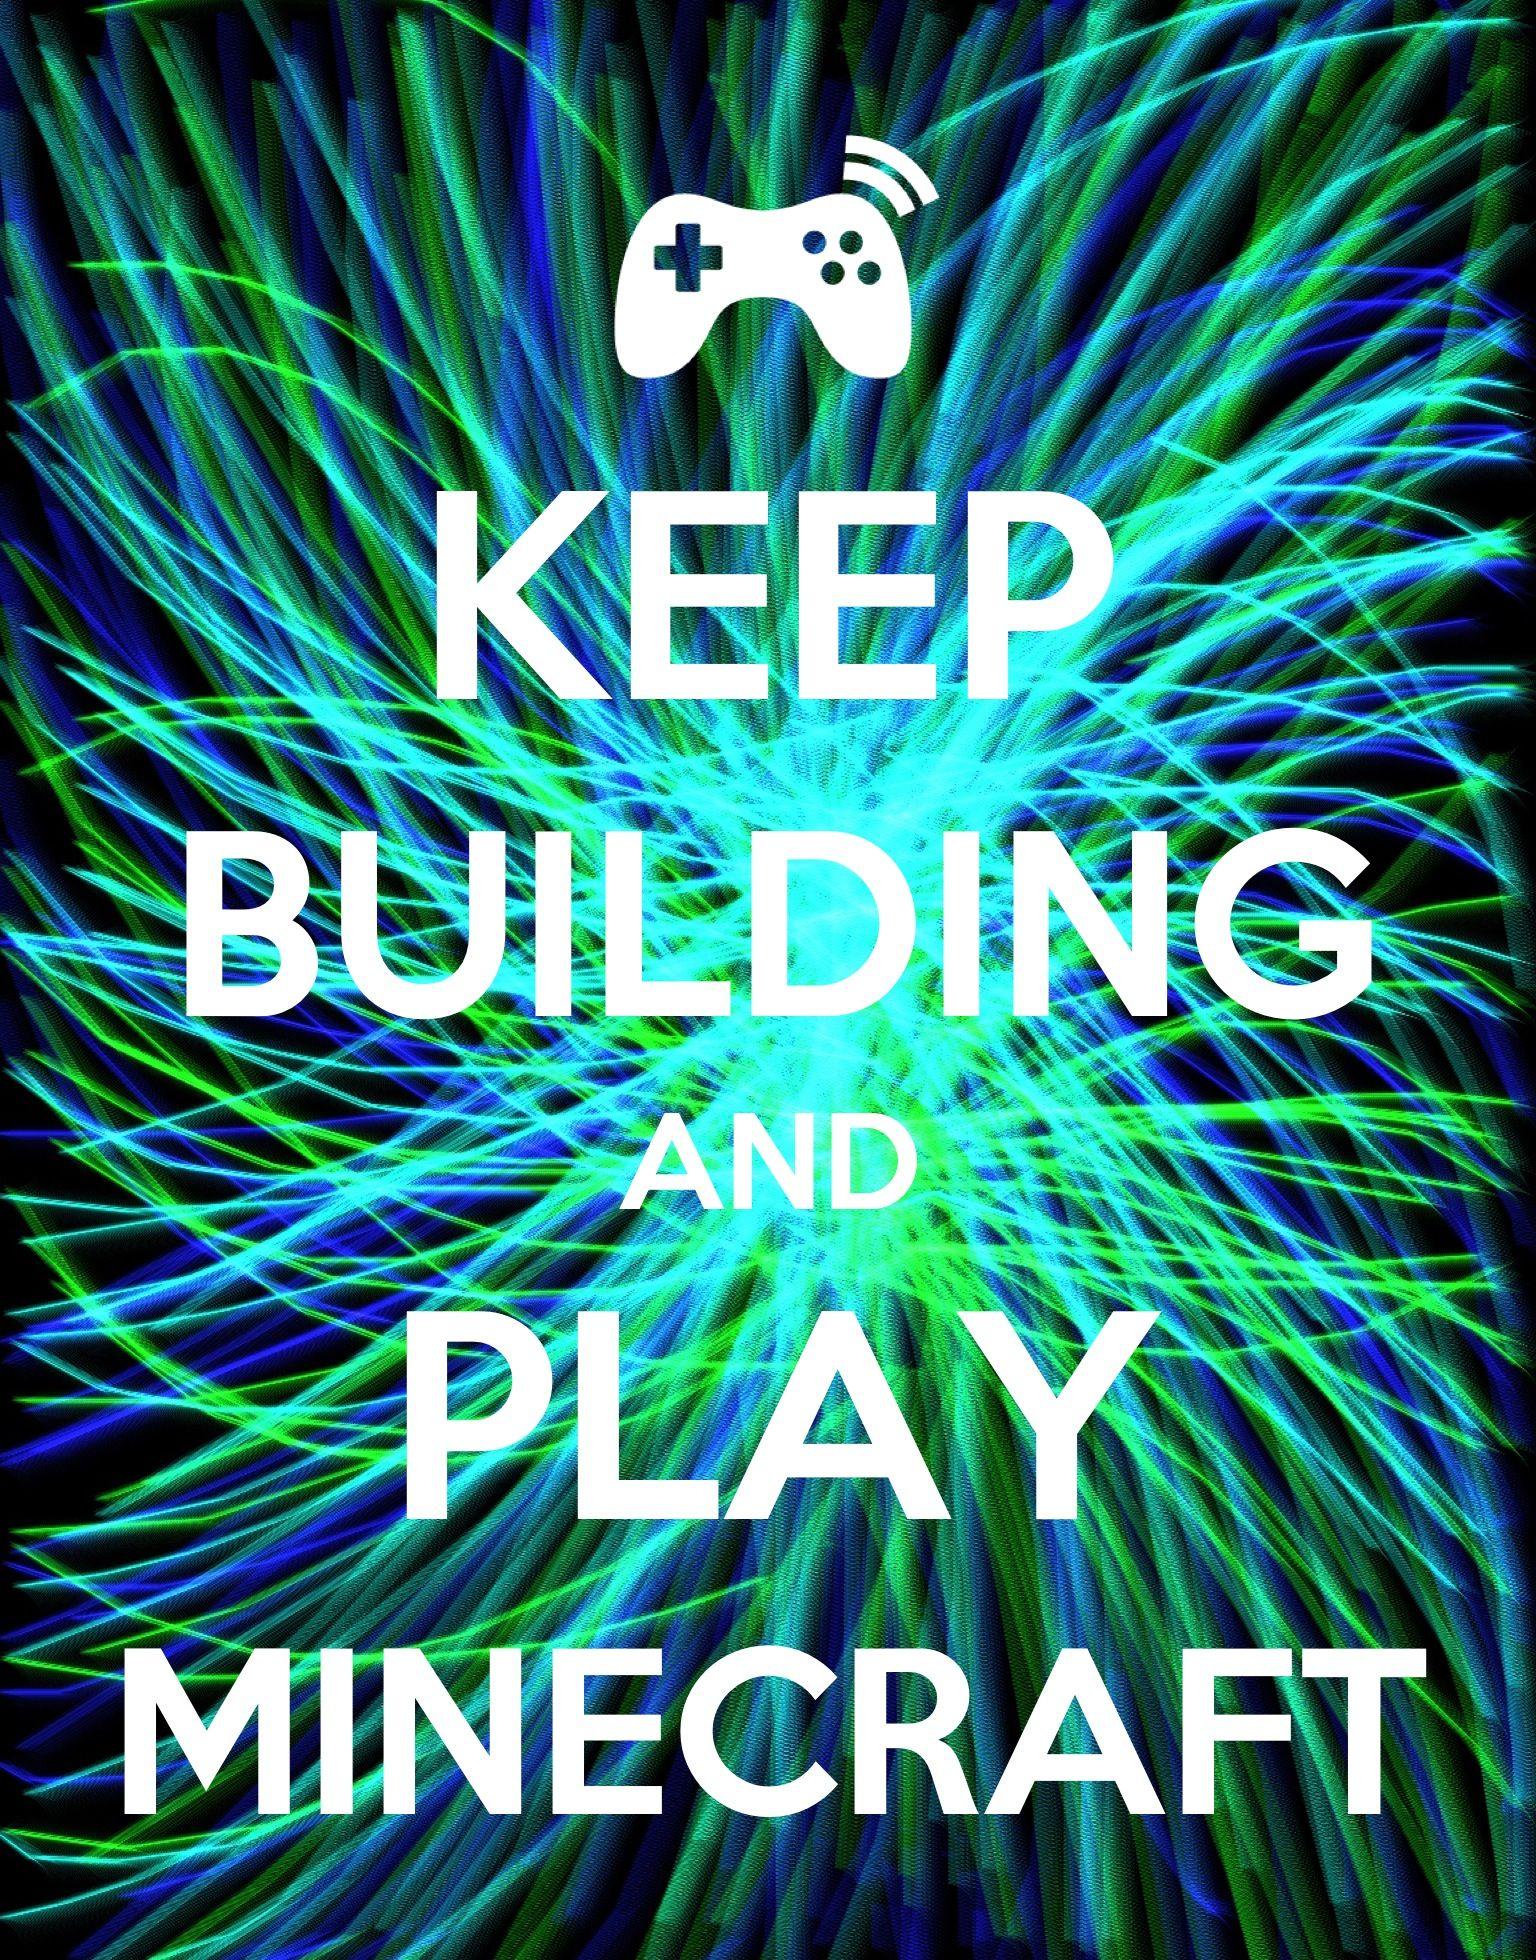 Most Inspiring Wallpaper Minecraft Quote - 9c0d5391da52b16cec19a1ff69c80488  HD_371956.jpg